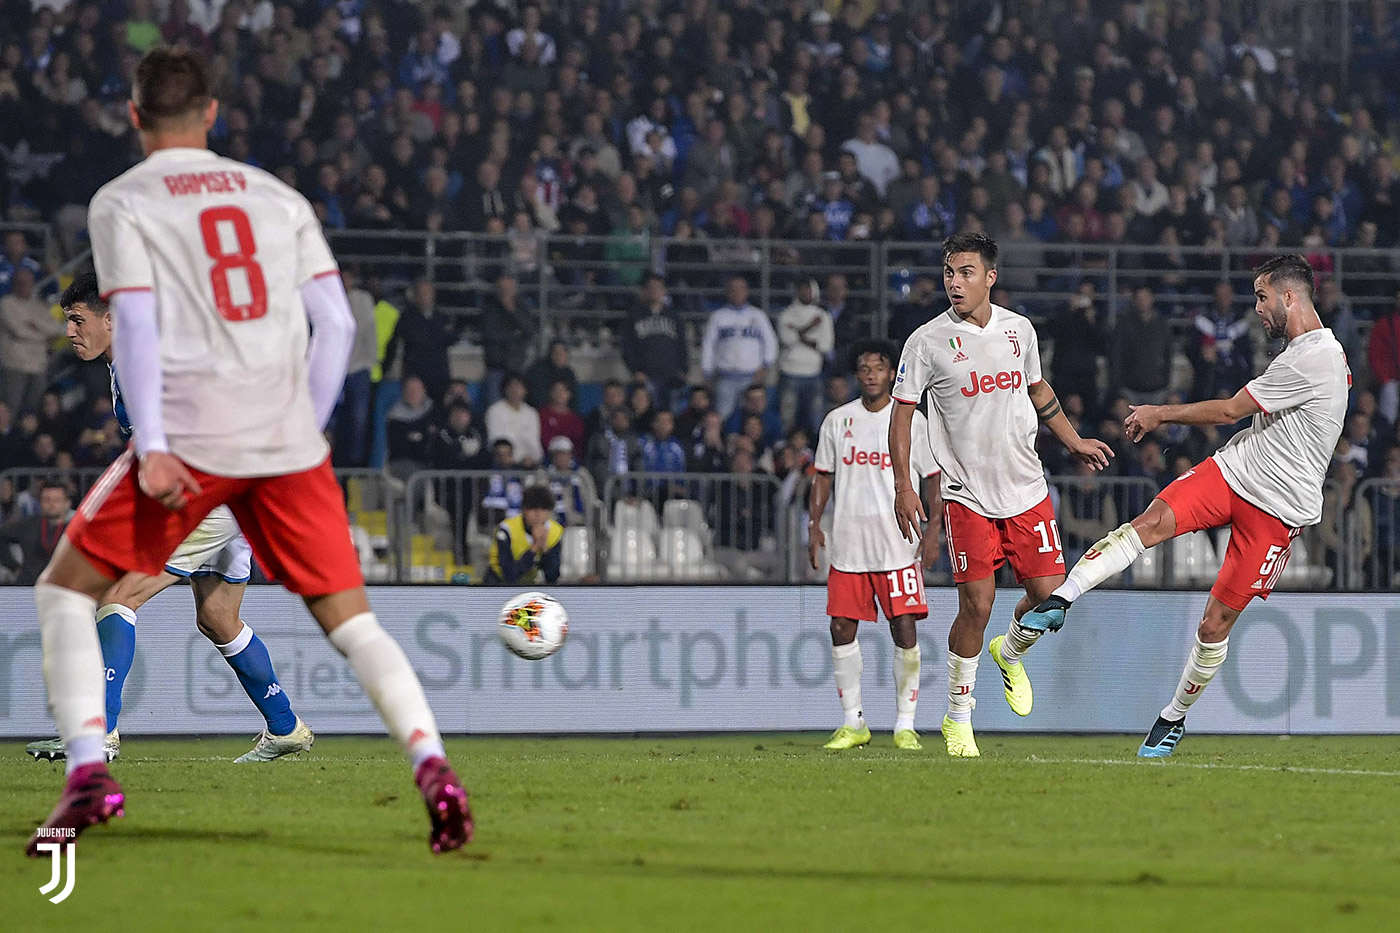 CALCIO Brescia-Juventus 1-2